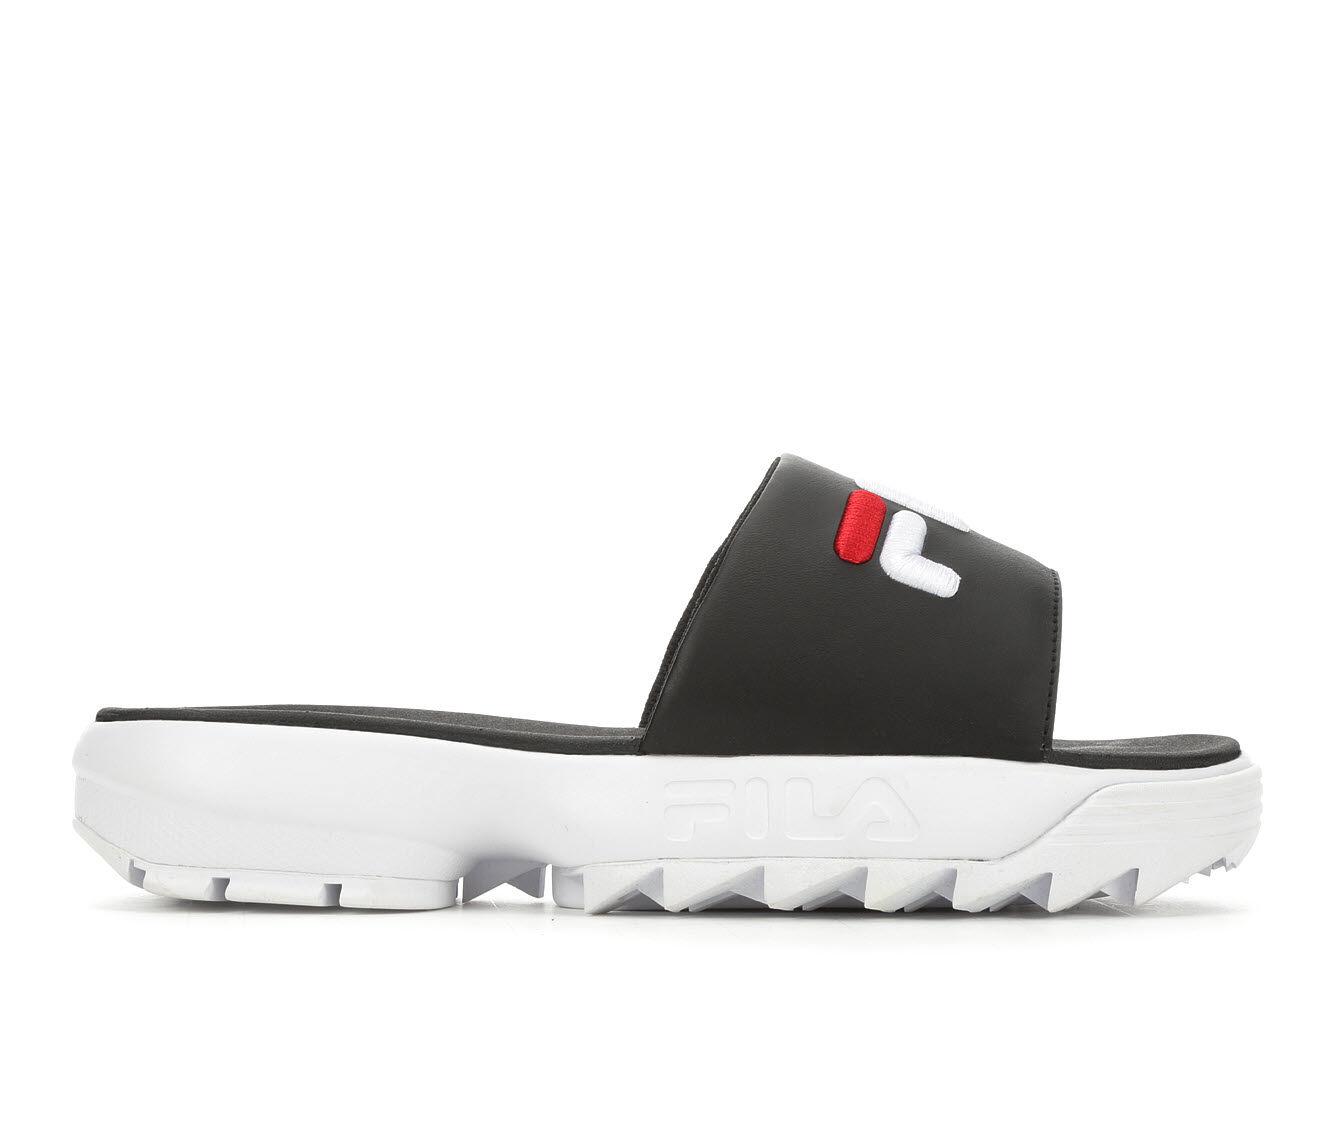 uk shoes_kd2743